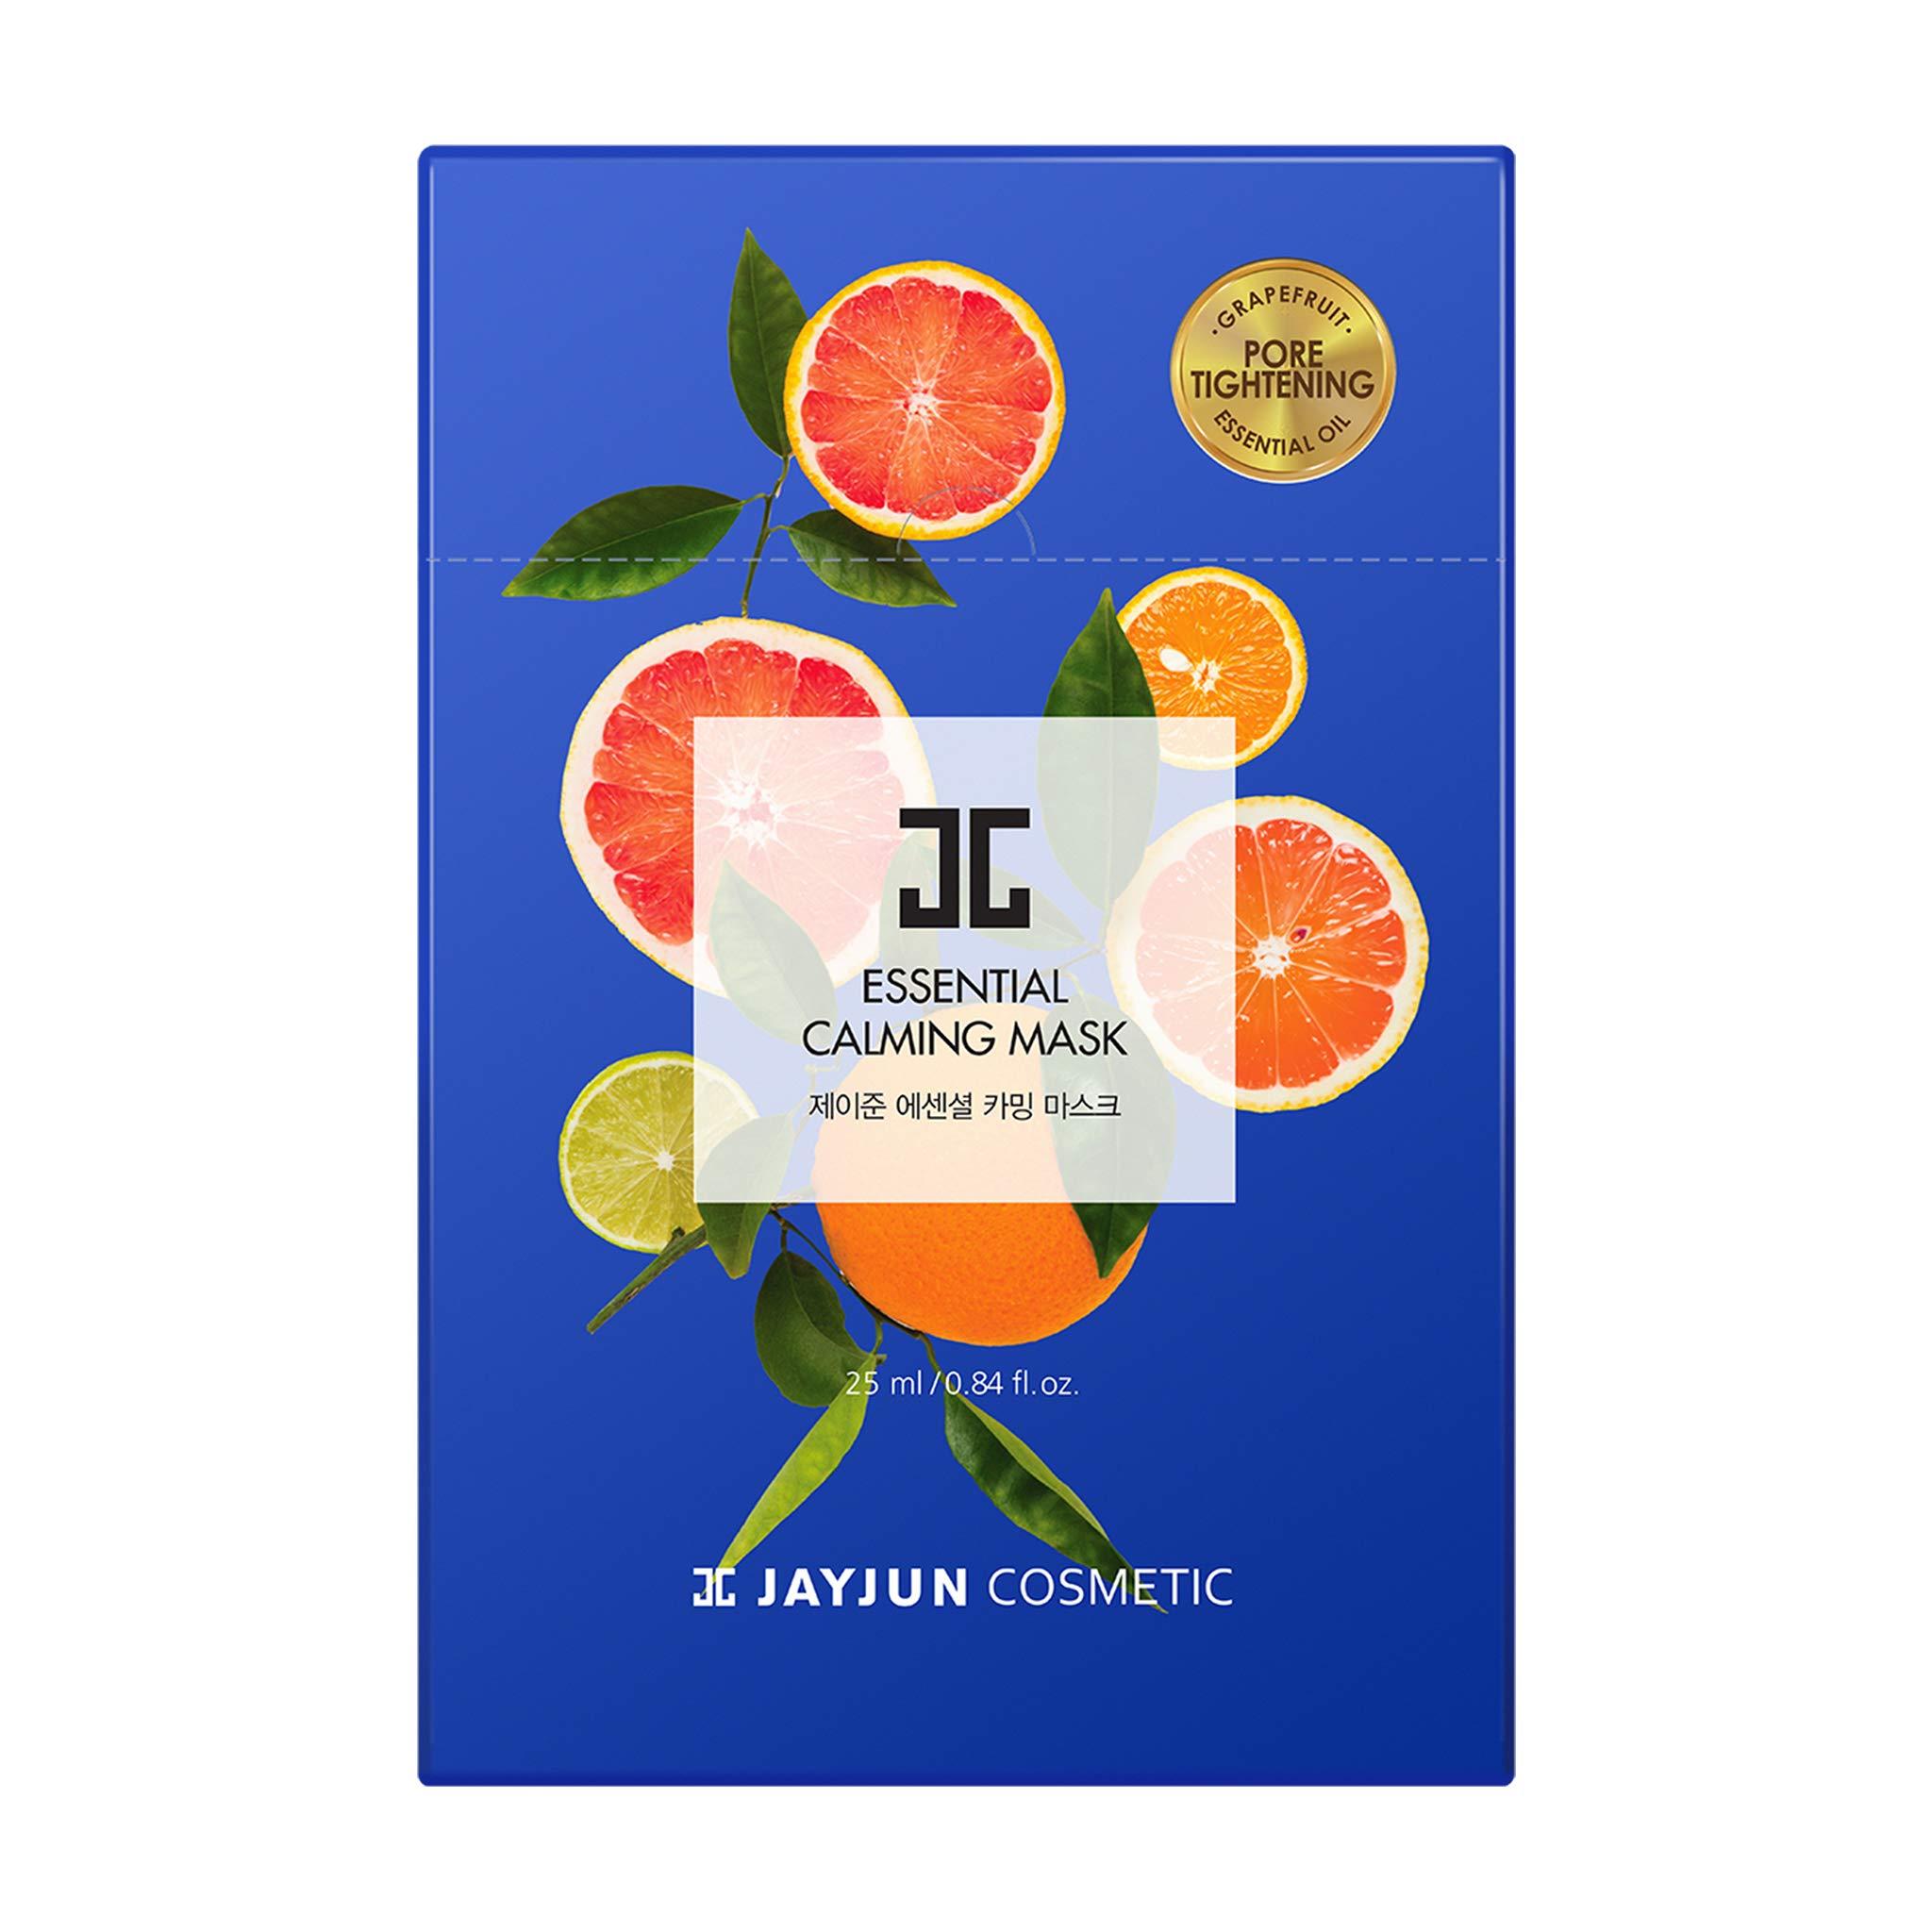 amazon.com - JAYJUN Essential Calming Mask, Pack of 10 Sheets, Grapefruit, Tea Tree, Soothing, Sheet Mask, Hydrating